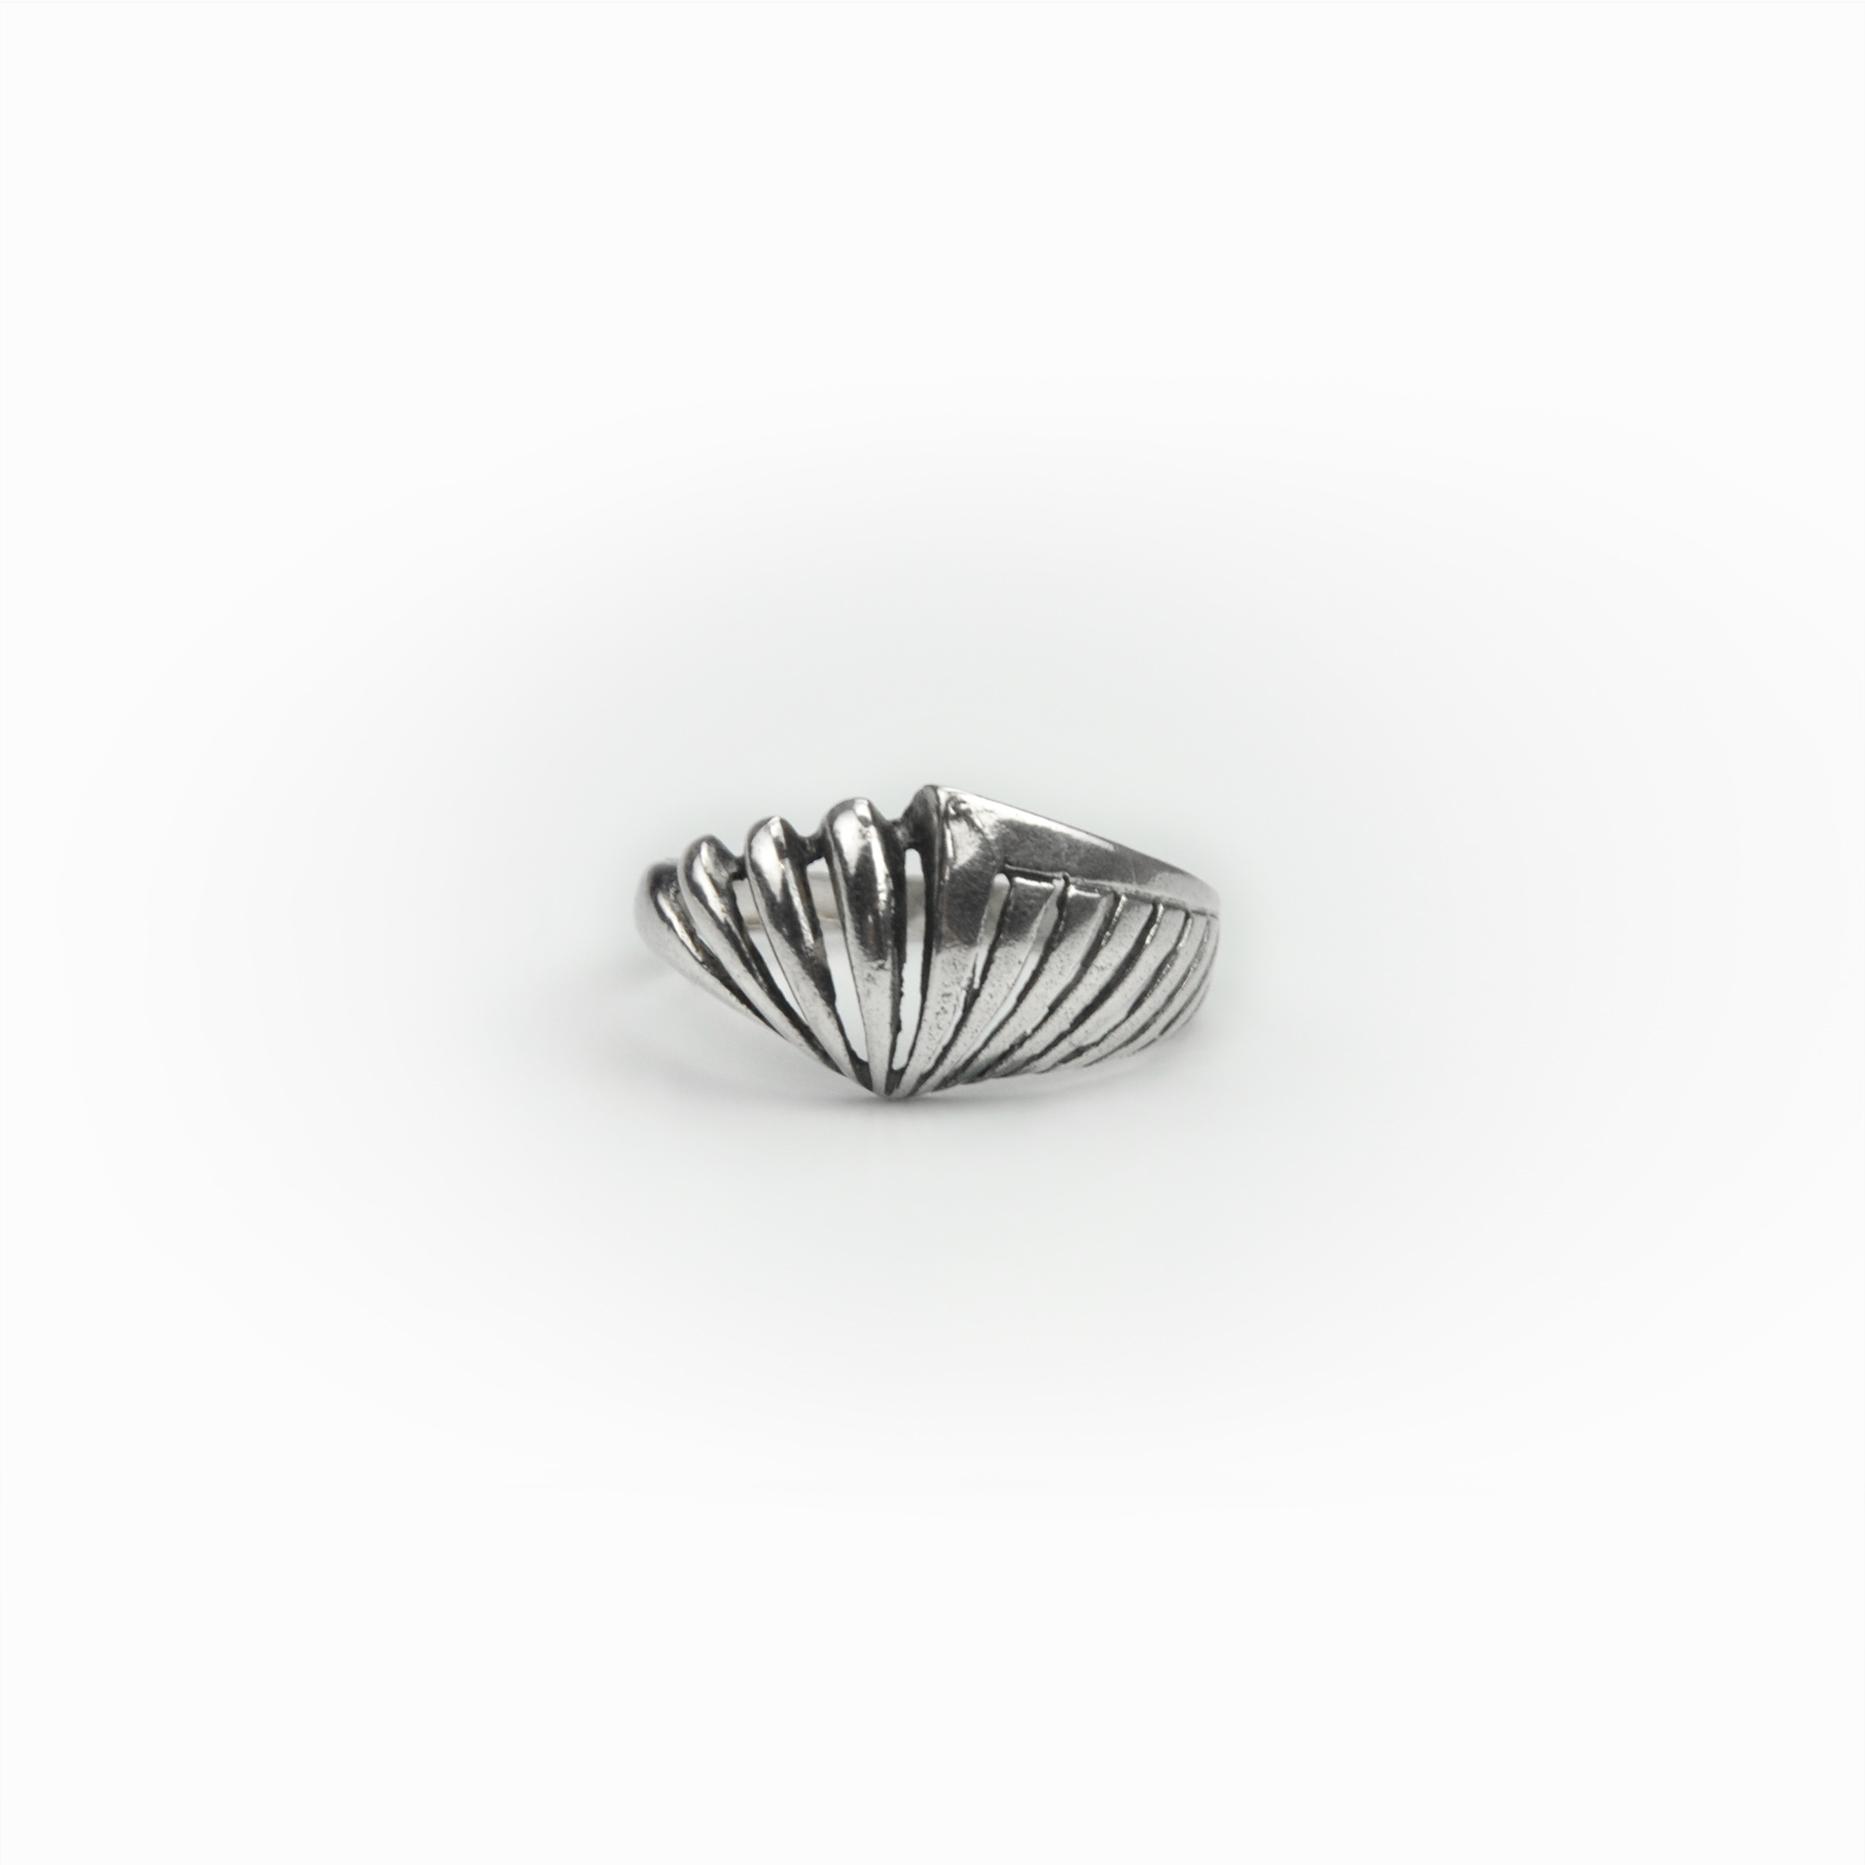 Anel concha em prata (2)